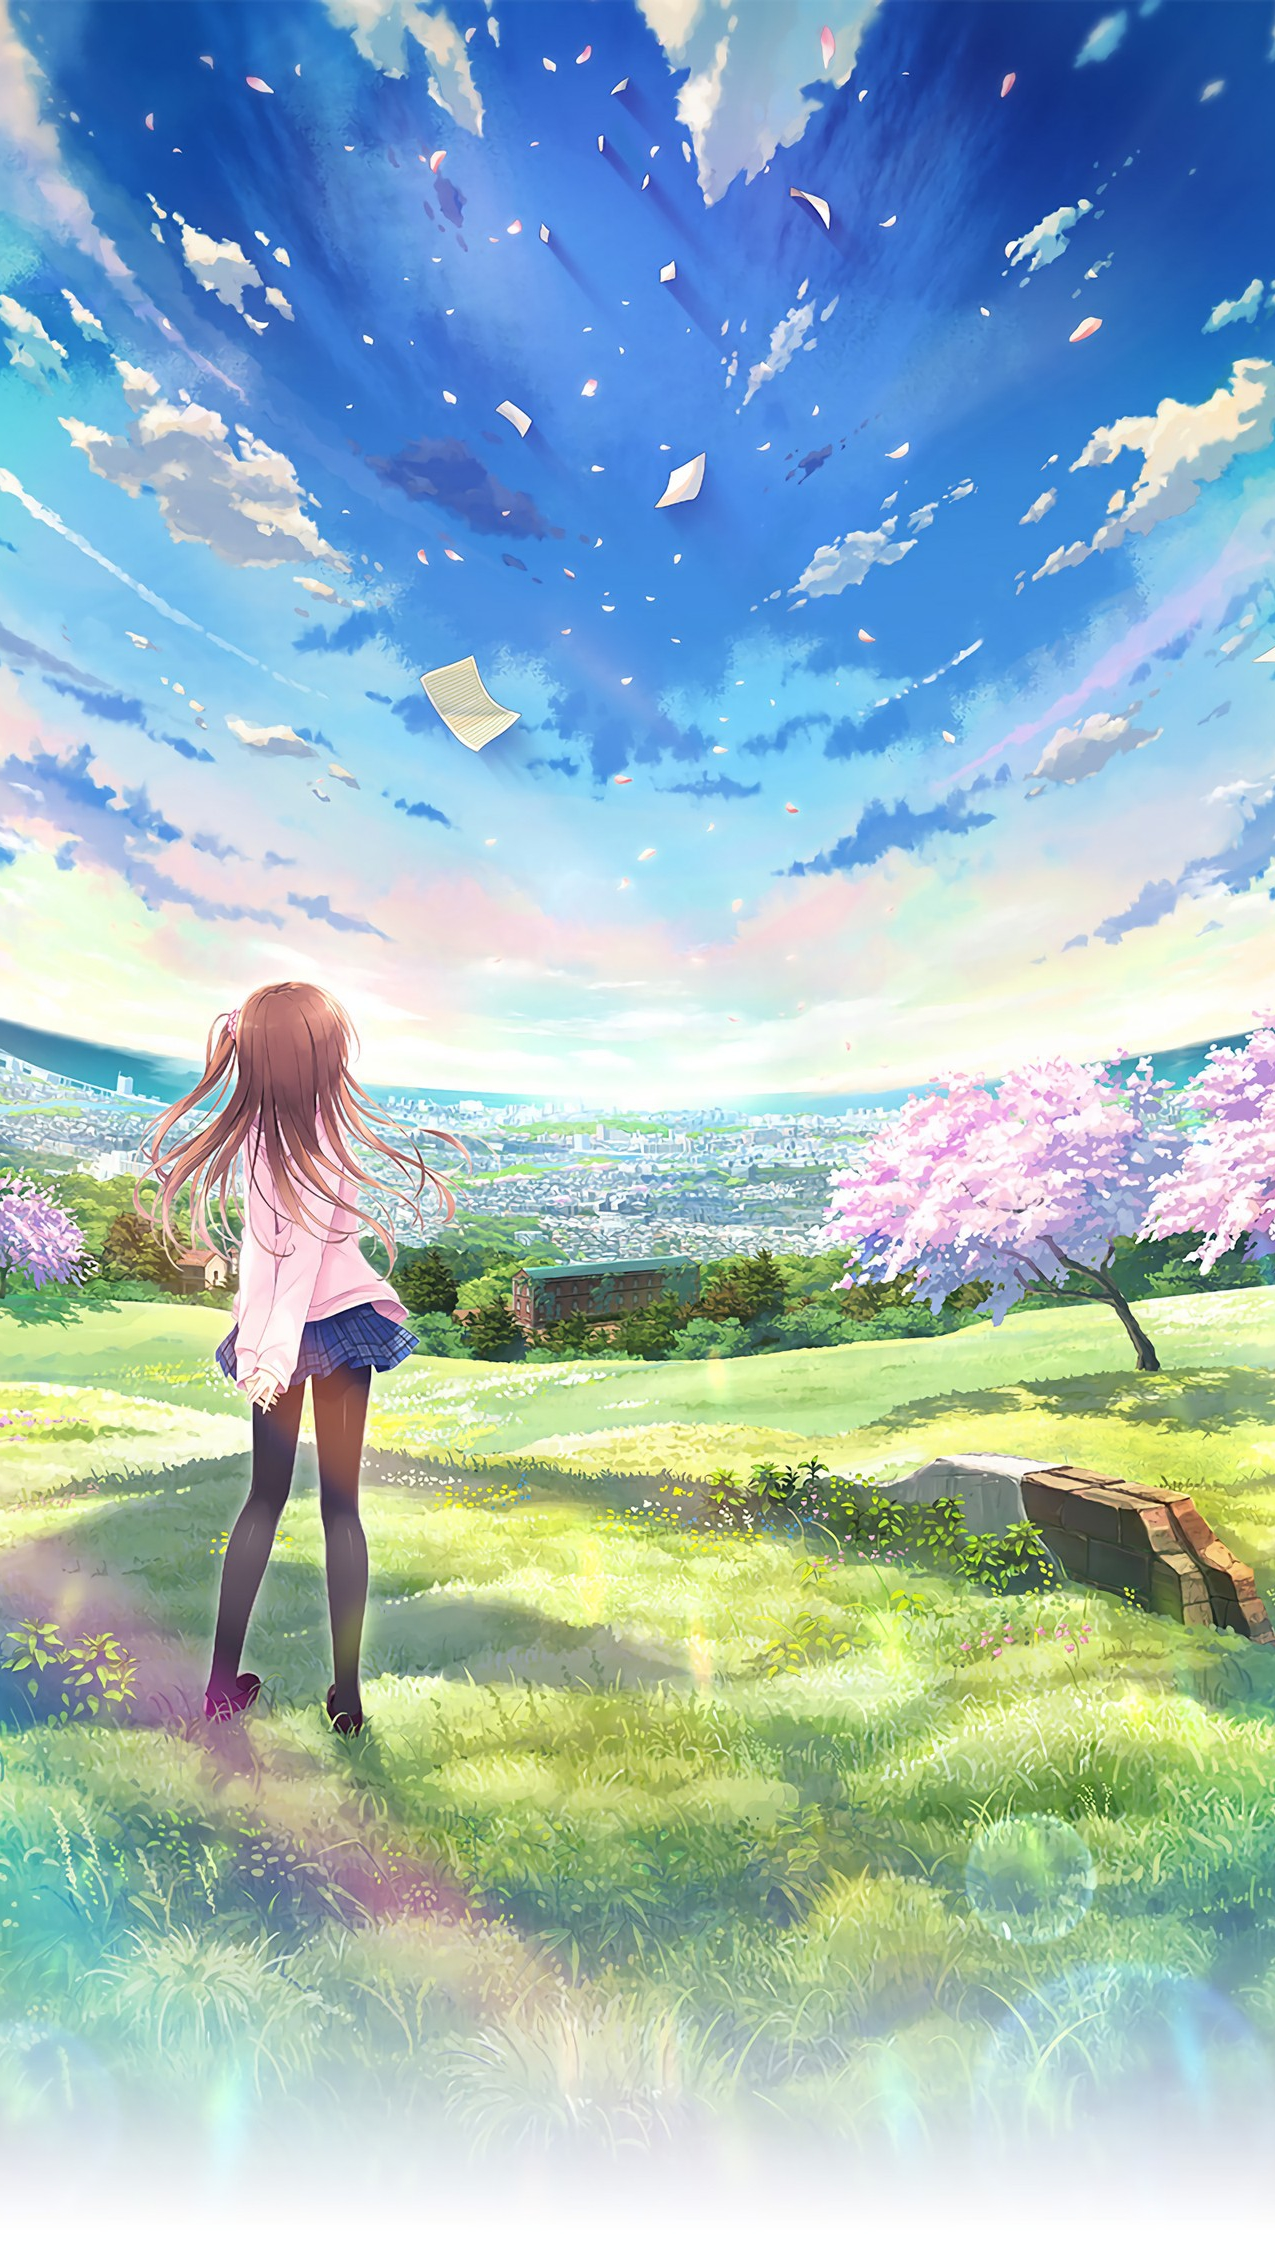 Anime World Beautiful Girl Sky iPhone Wallpaper iphoneswallpapers com